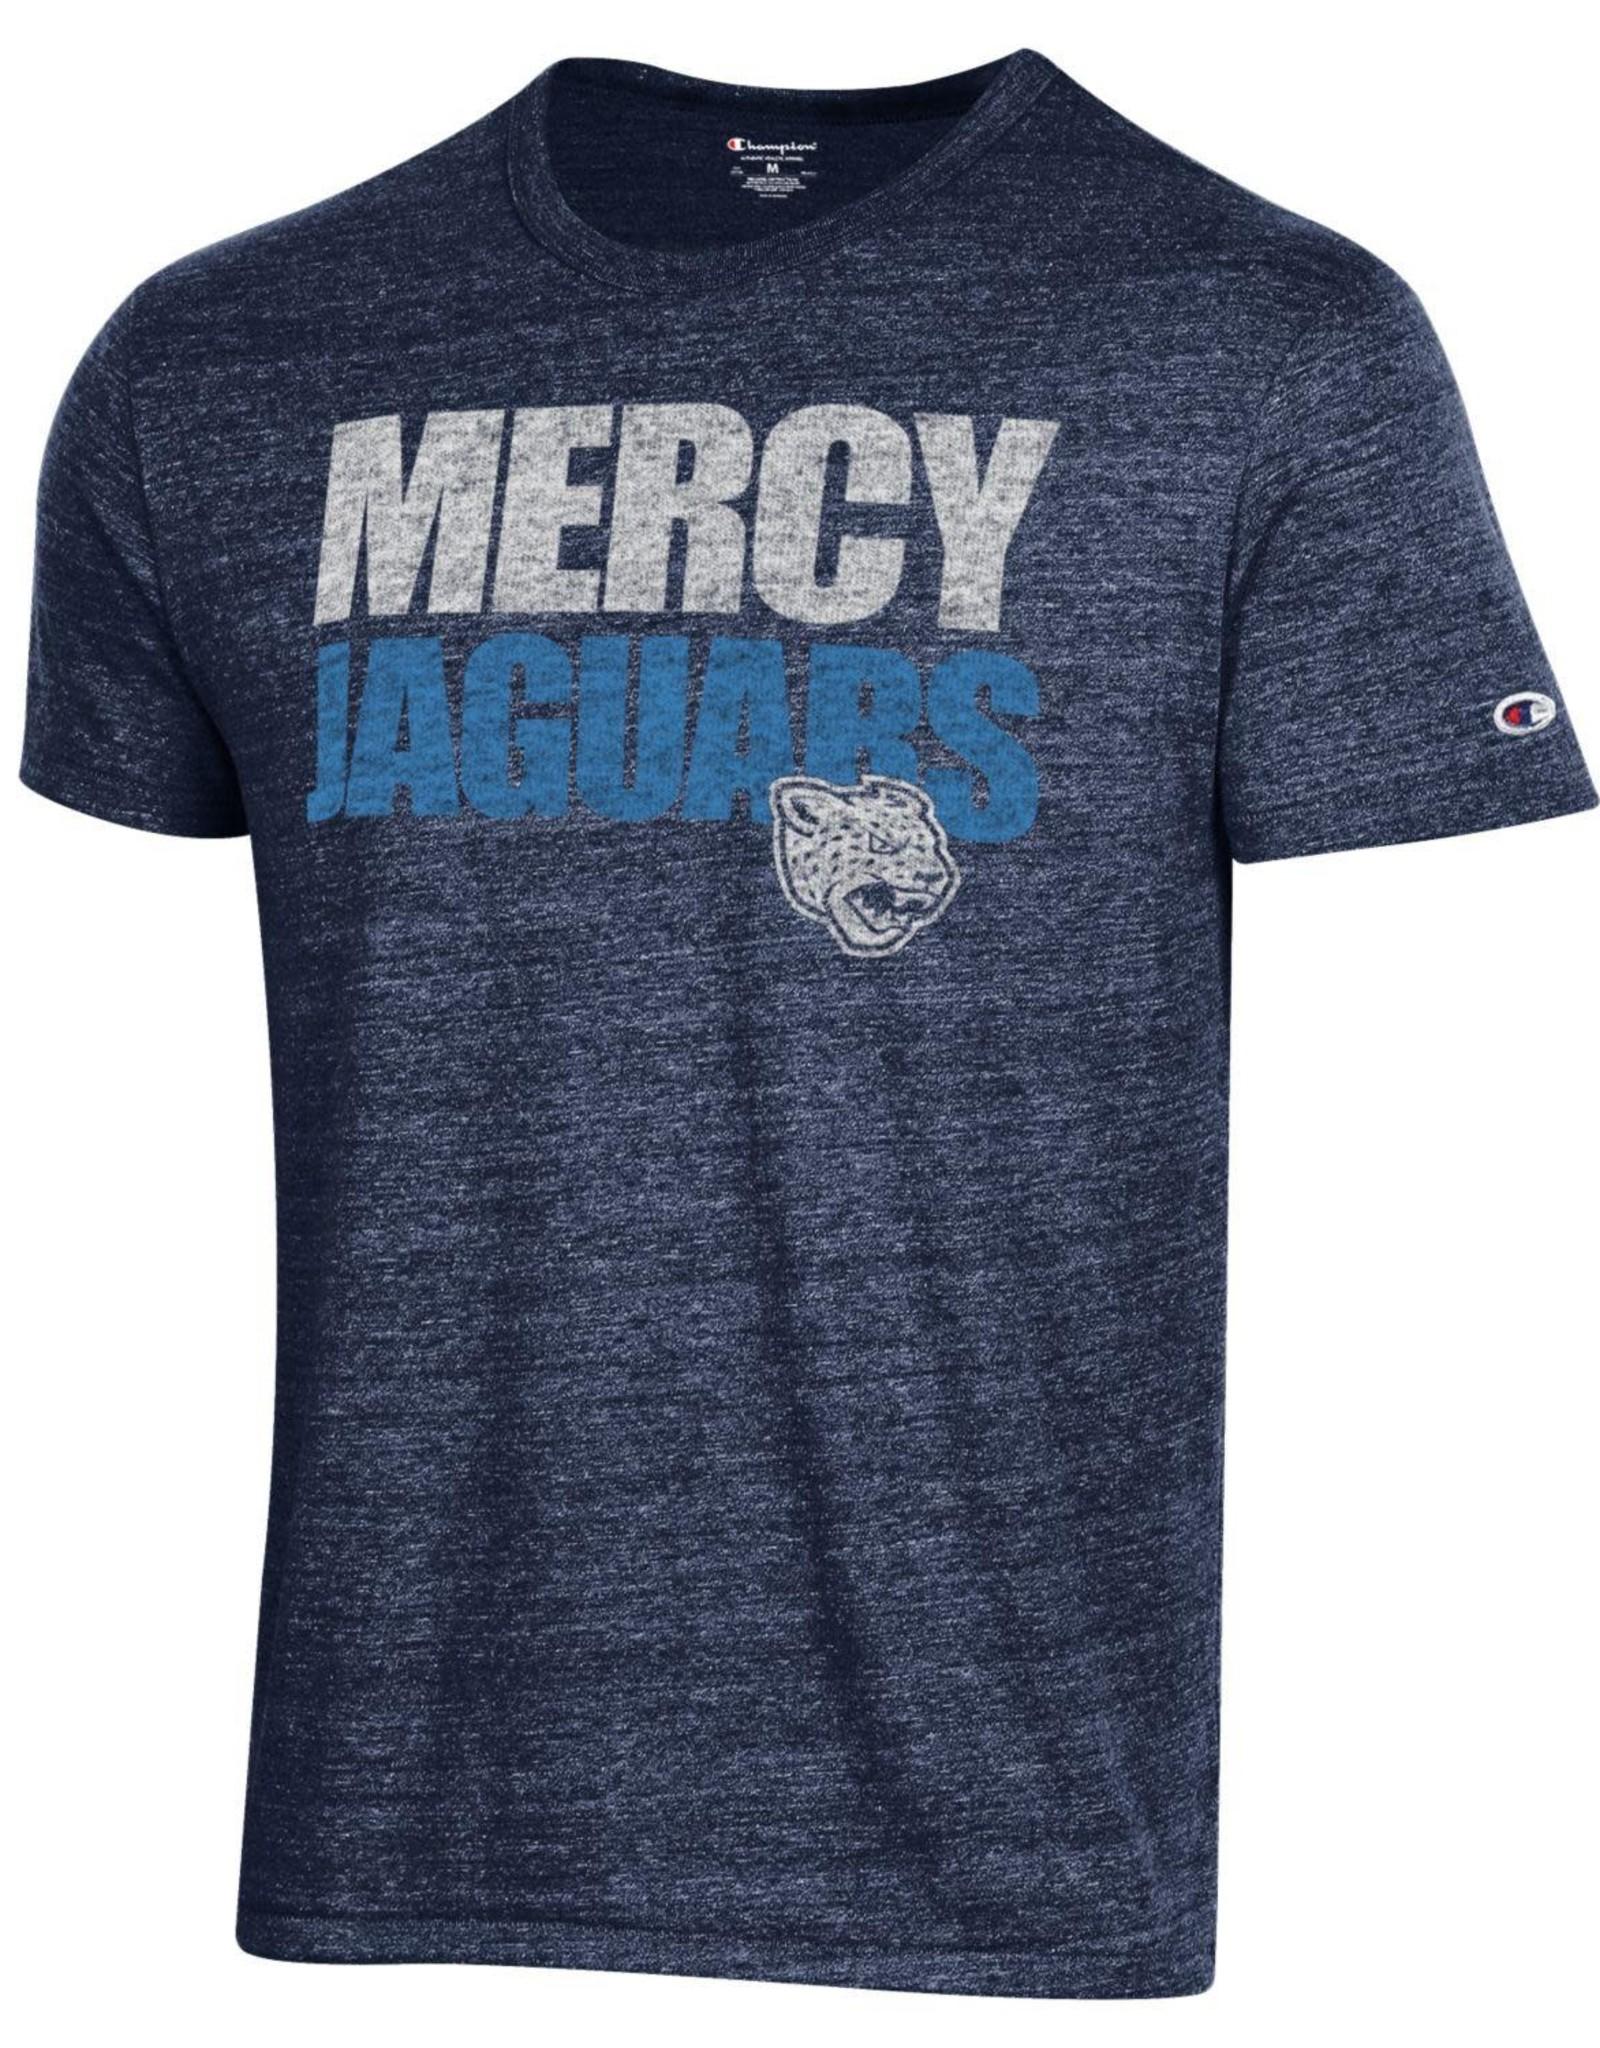 CHAMPION Mercy Jaguars Mascot Navy Tee